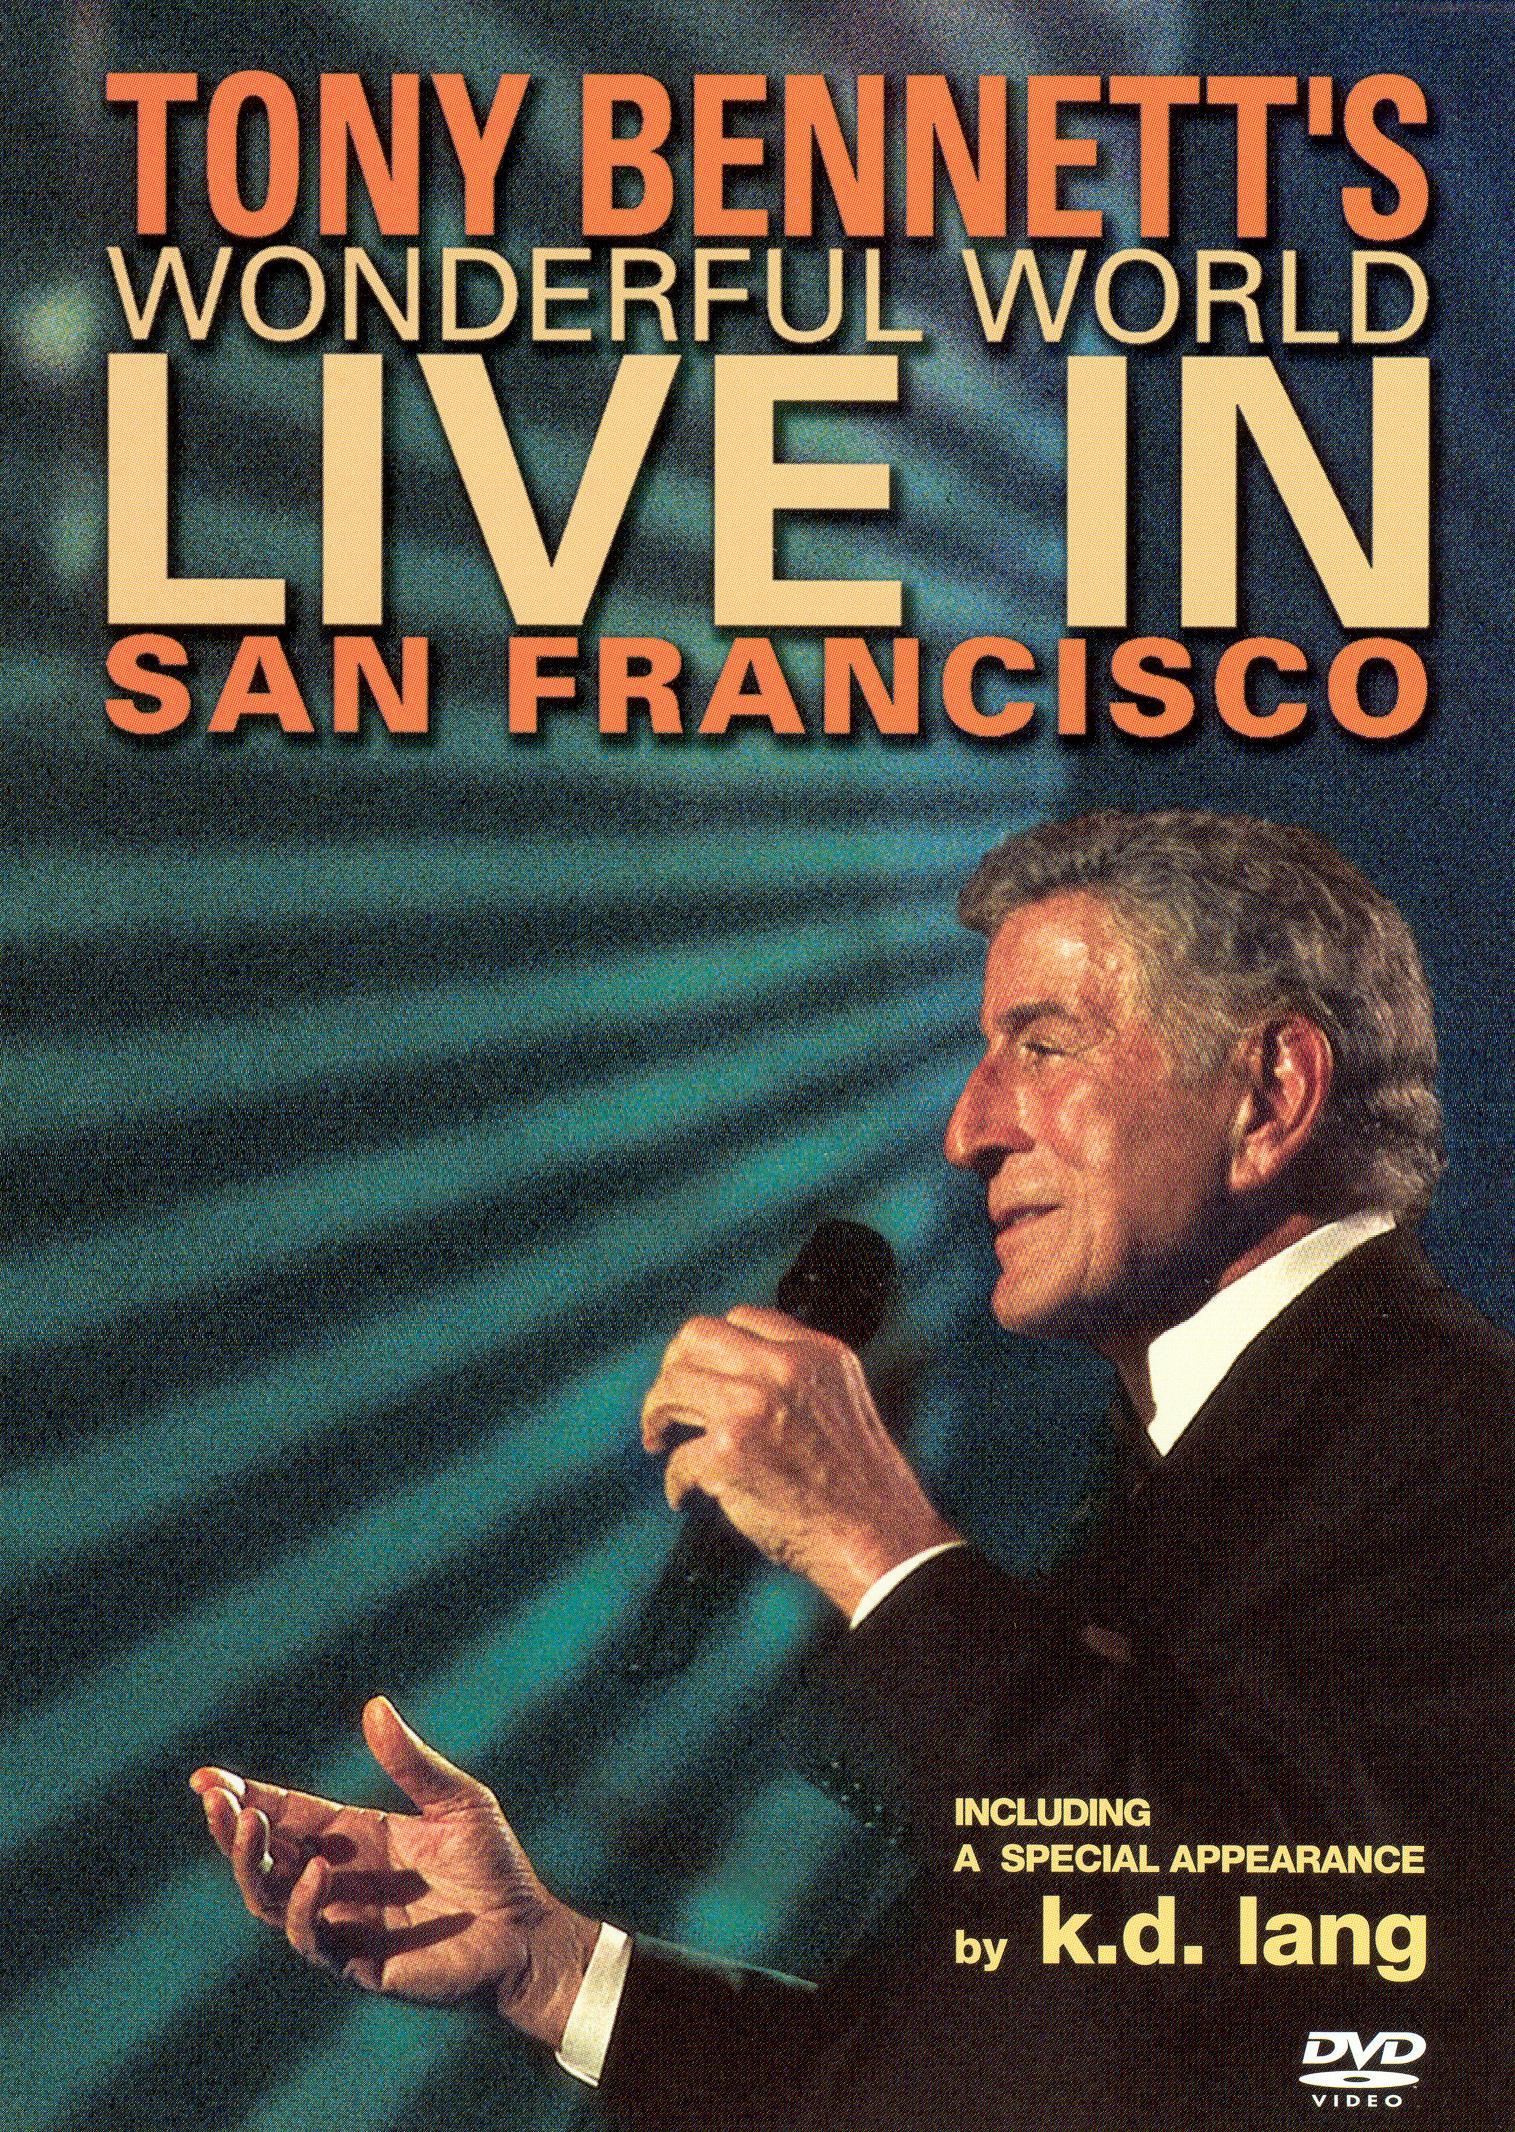 Tony Bennett's Wonderful World: Live in San Francisco